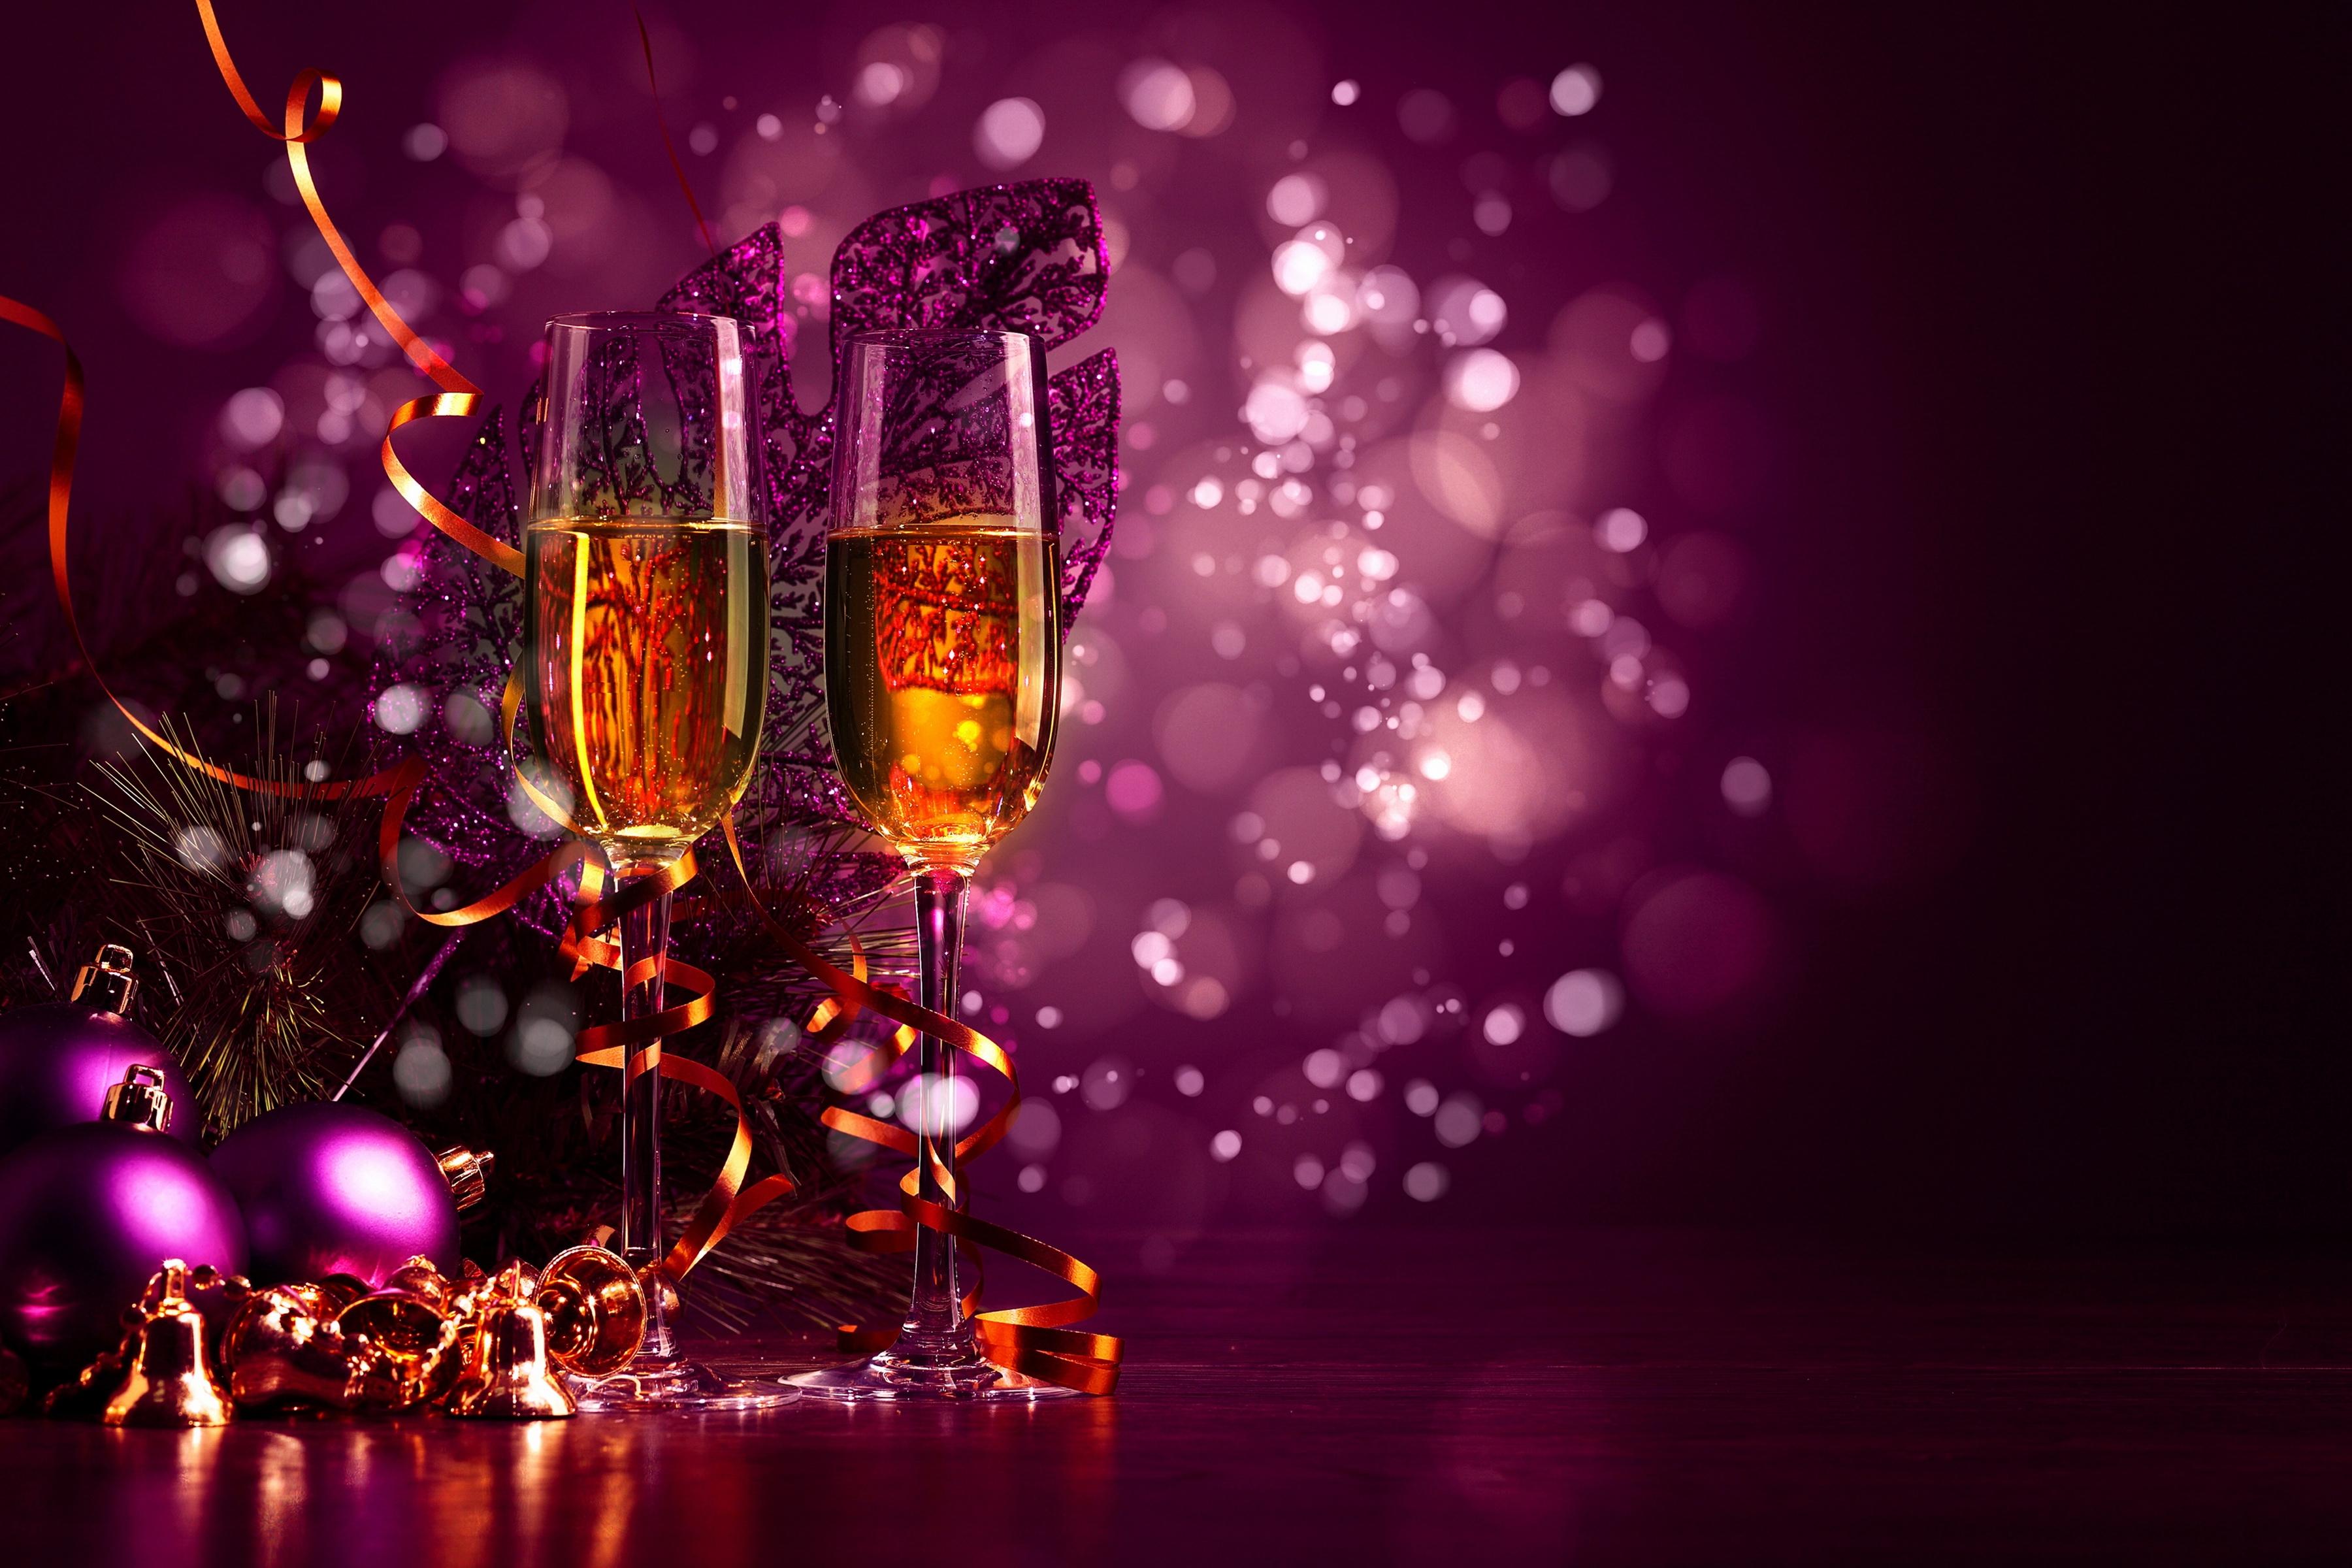 champagne 3600x2400 wallpapertip